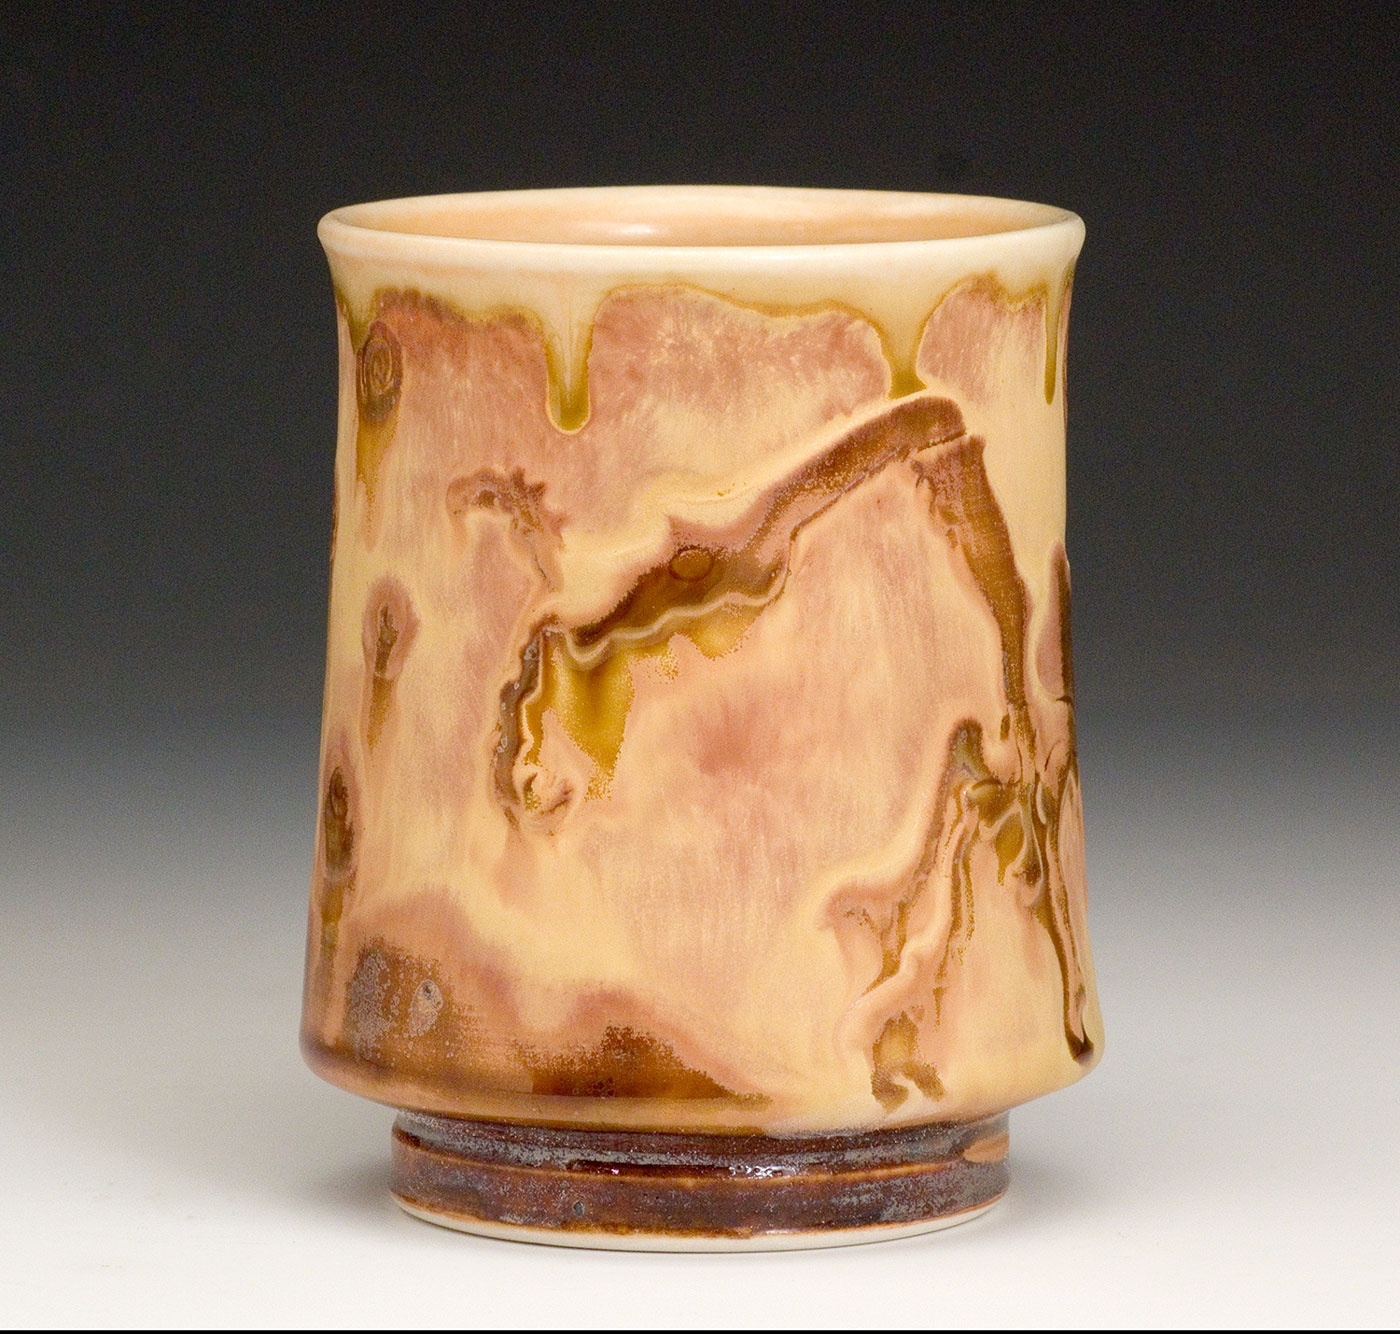 Giraffe-Weevil-Ceramic-Art-Cup-Samantha-Henneke.jpg